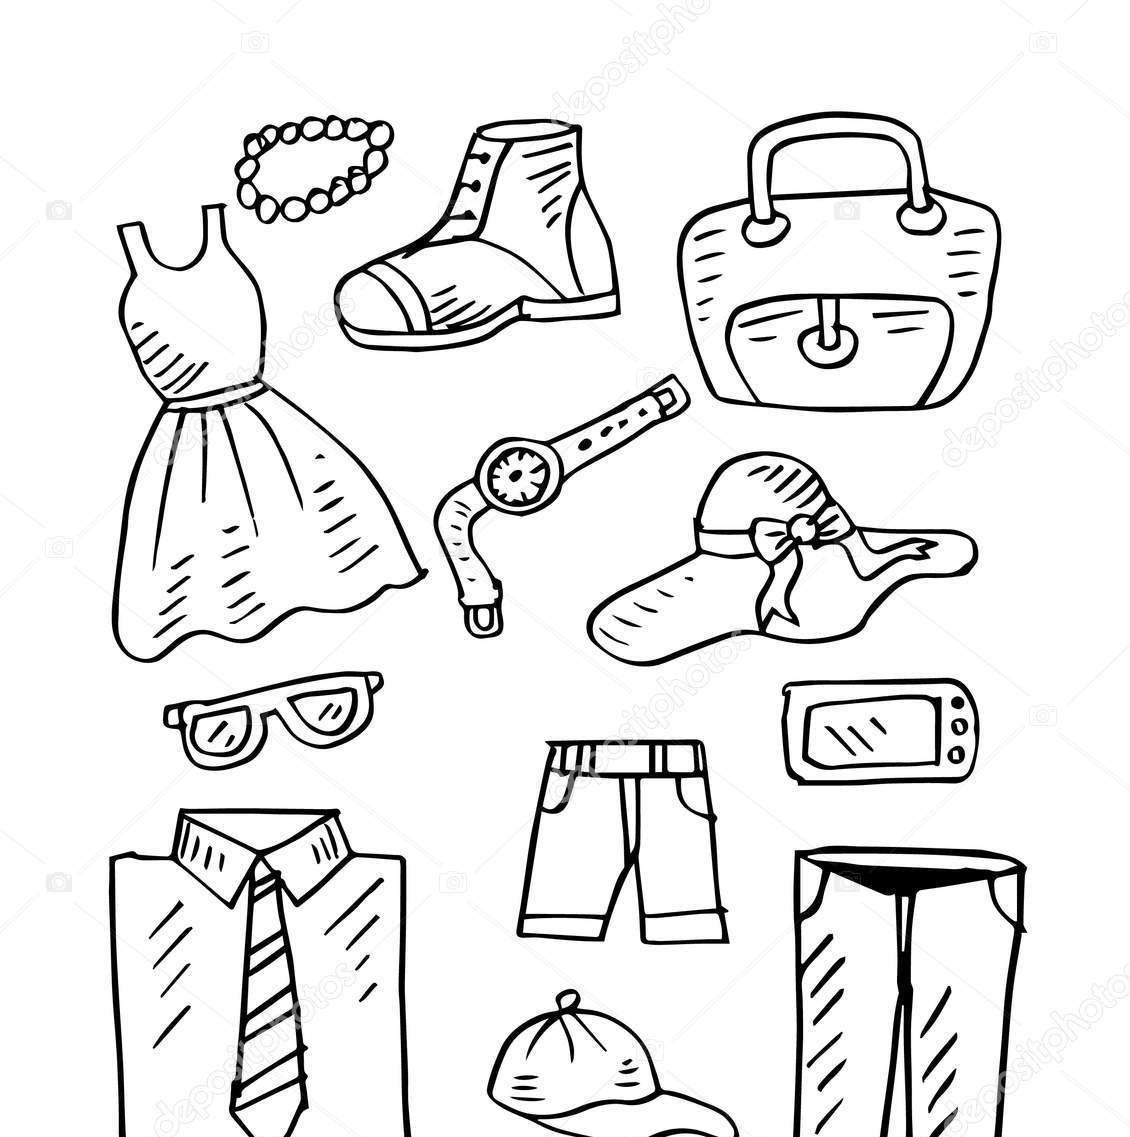 depositphotos_177373390-stock-photo-sketchy-fashion-clothes-accessories-set.jpg